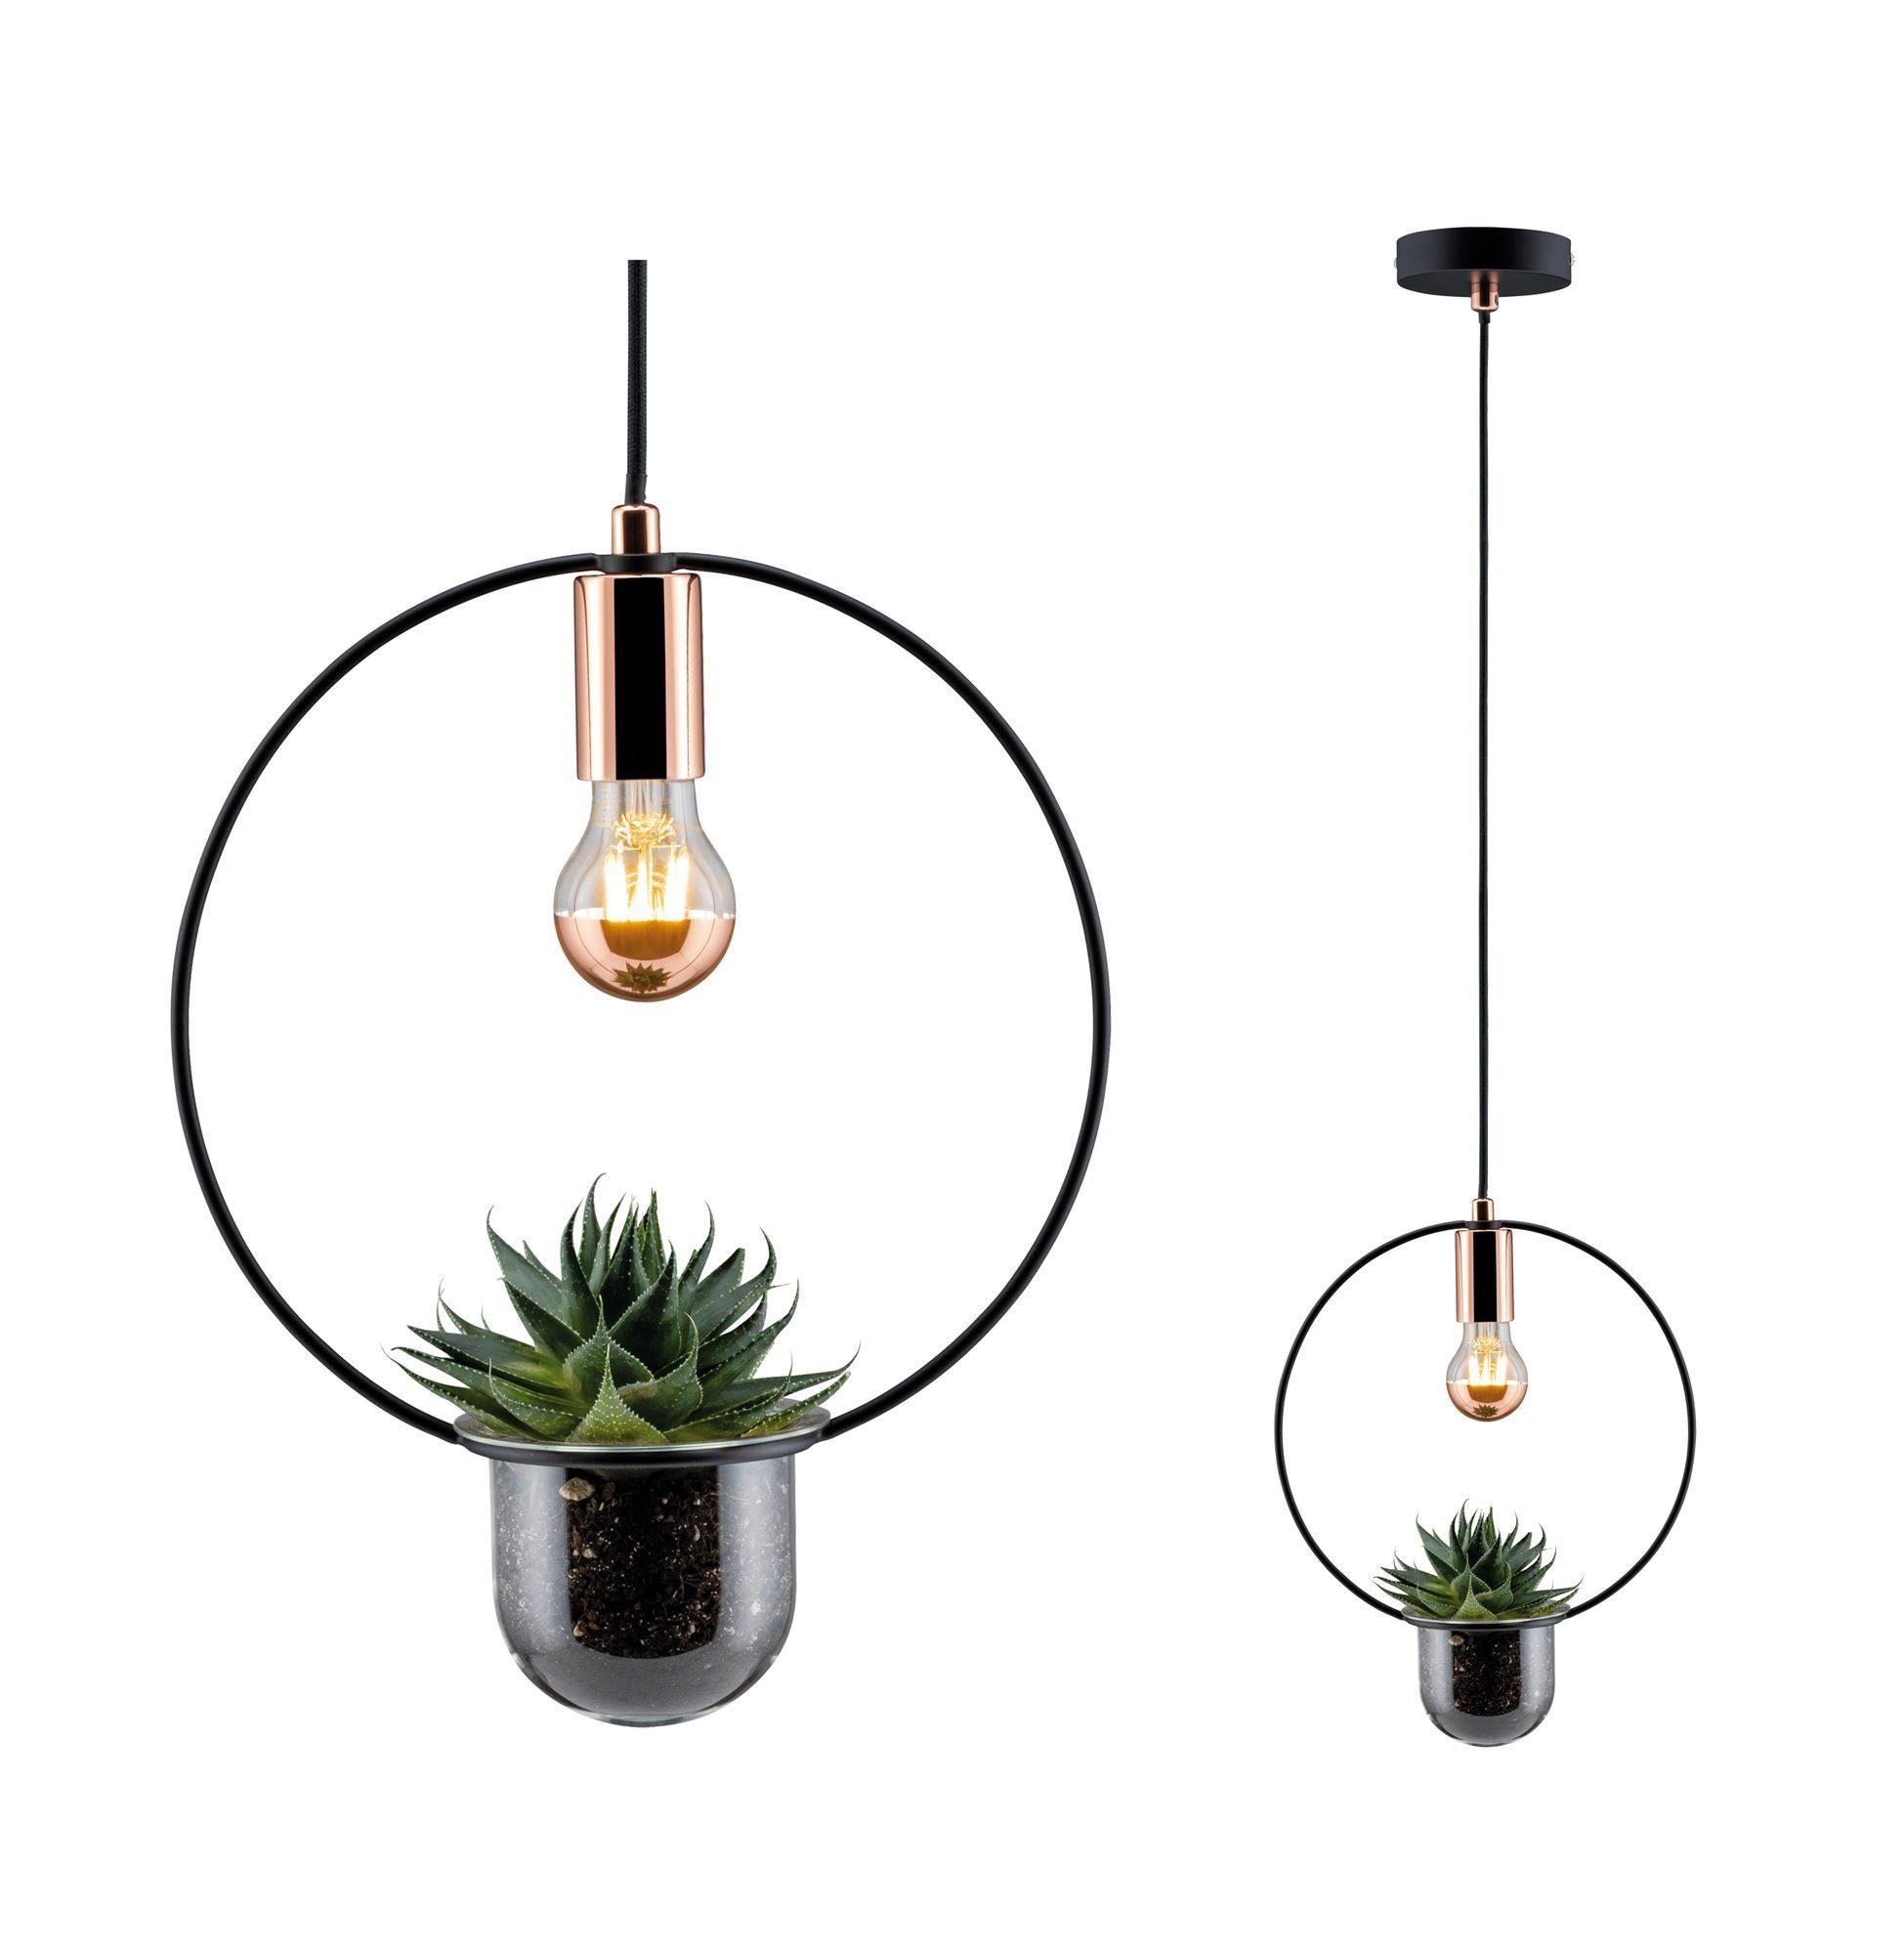 Paulmann LED Tischleuchte Tasja Schwarz/Kupfer 1-flammig Pflanzenleuchte, E27, 1 St.